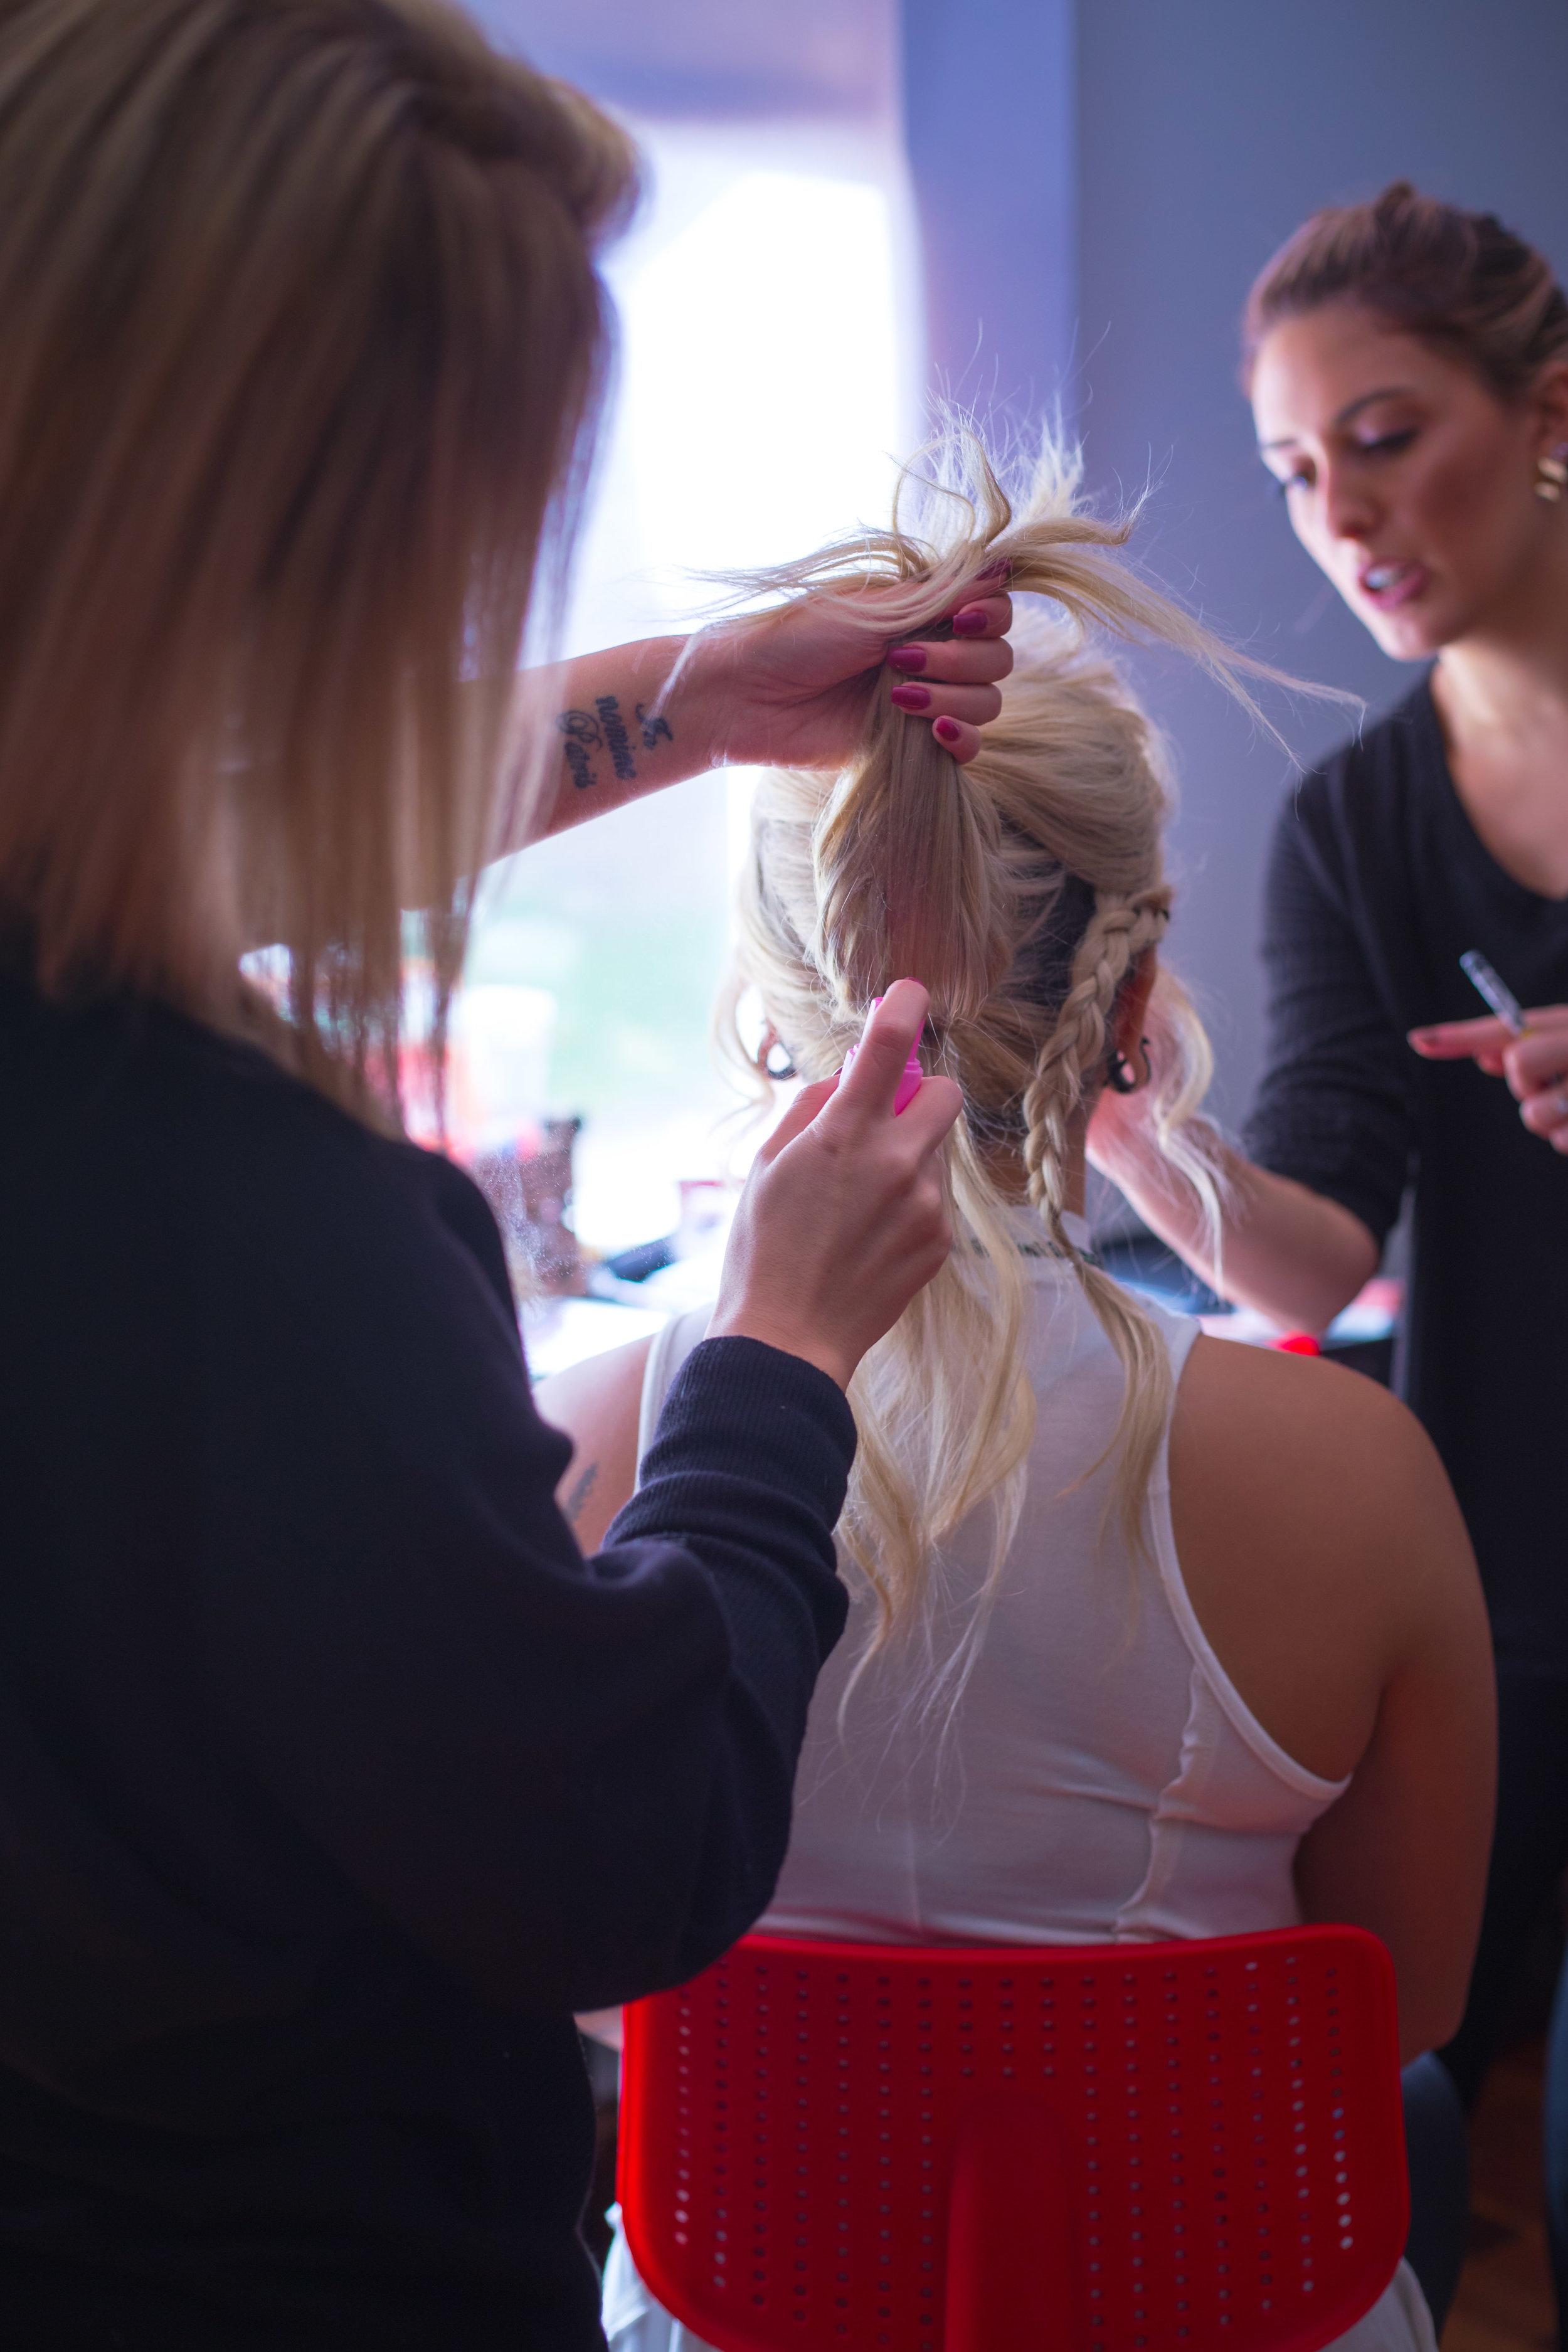 hudsonvalley-photographer-vendors-make-up-hair-portraits-2.jpg